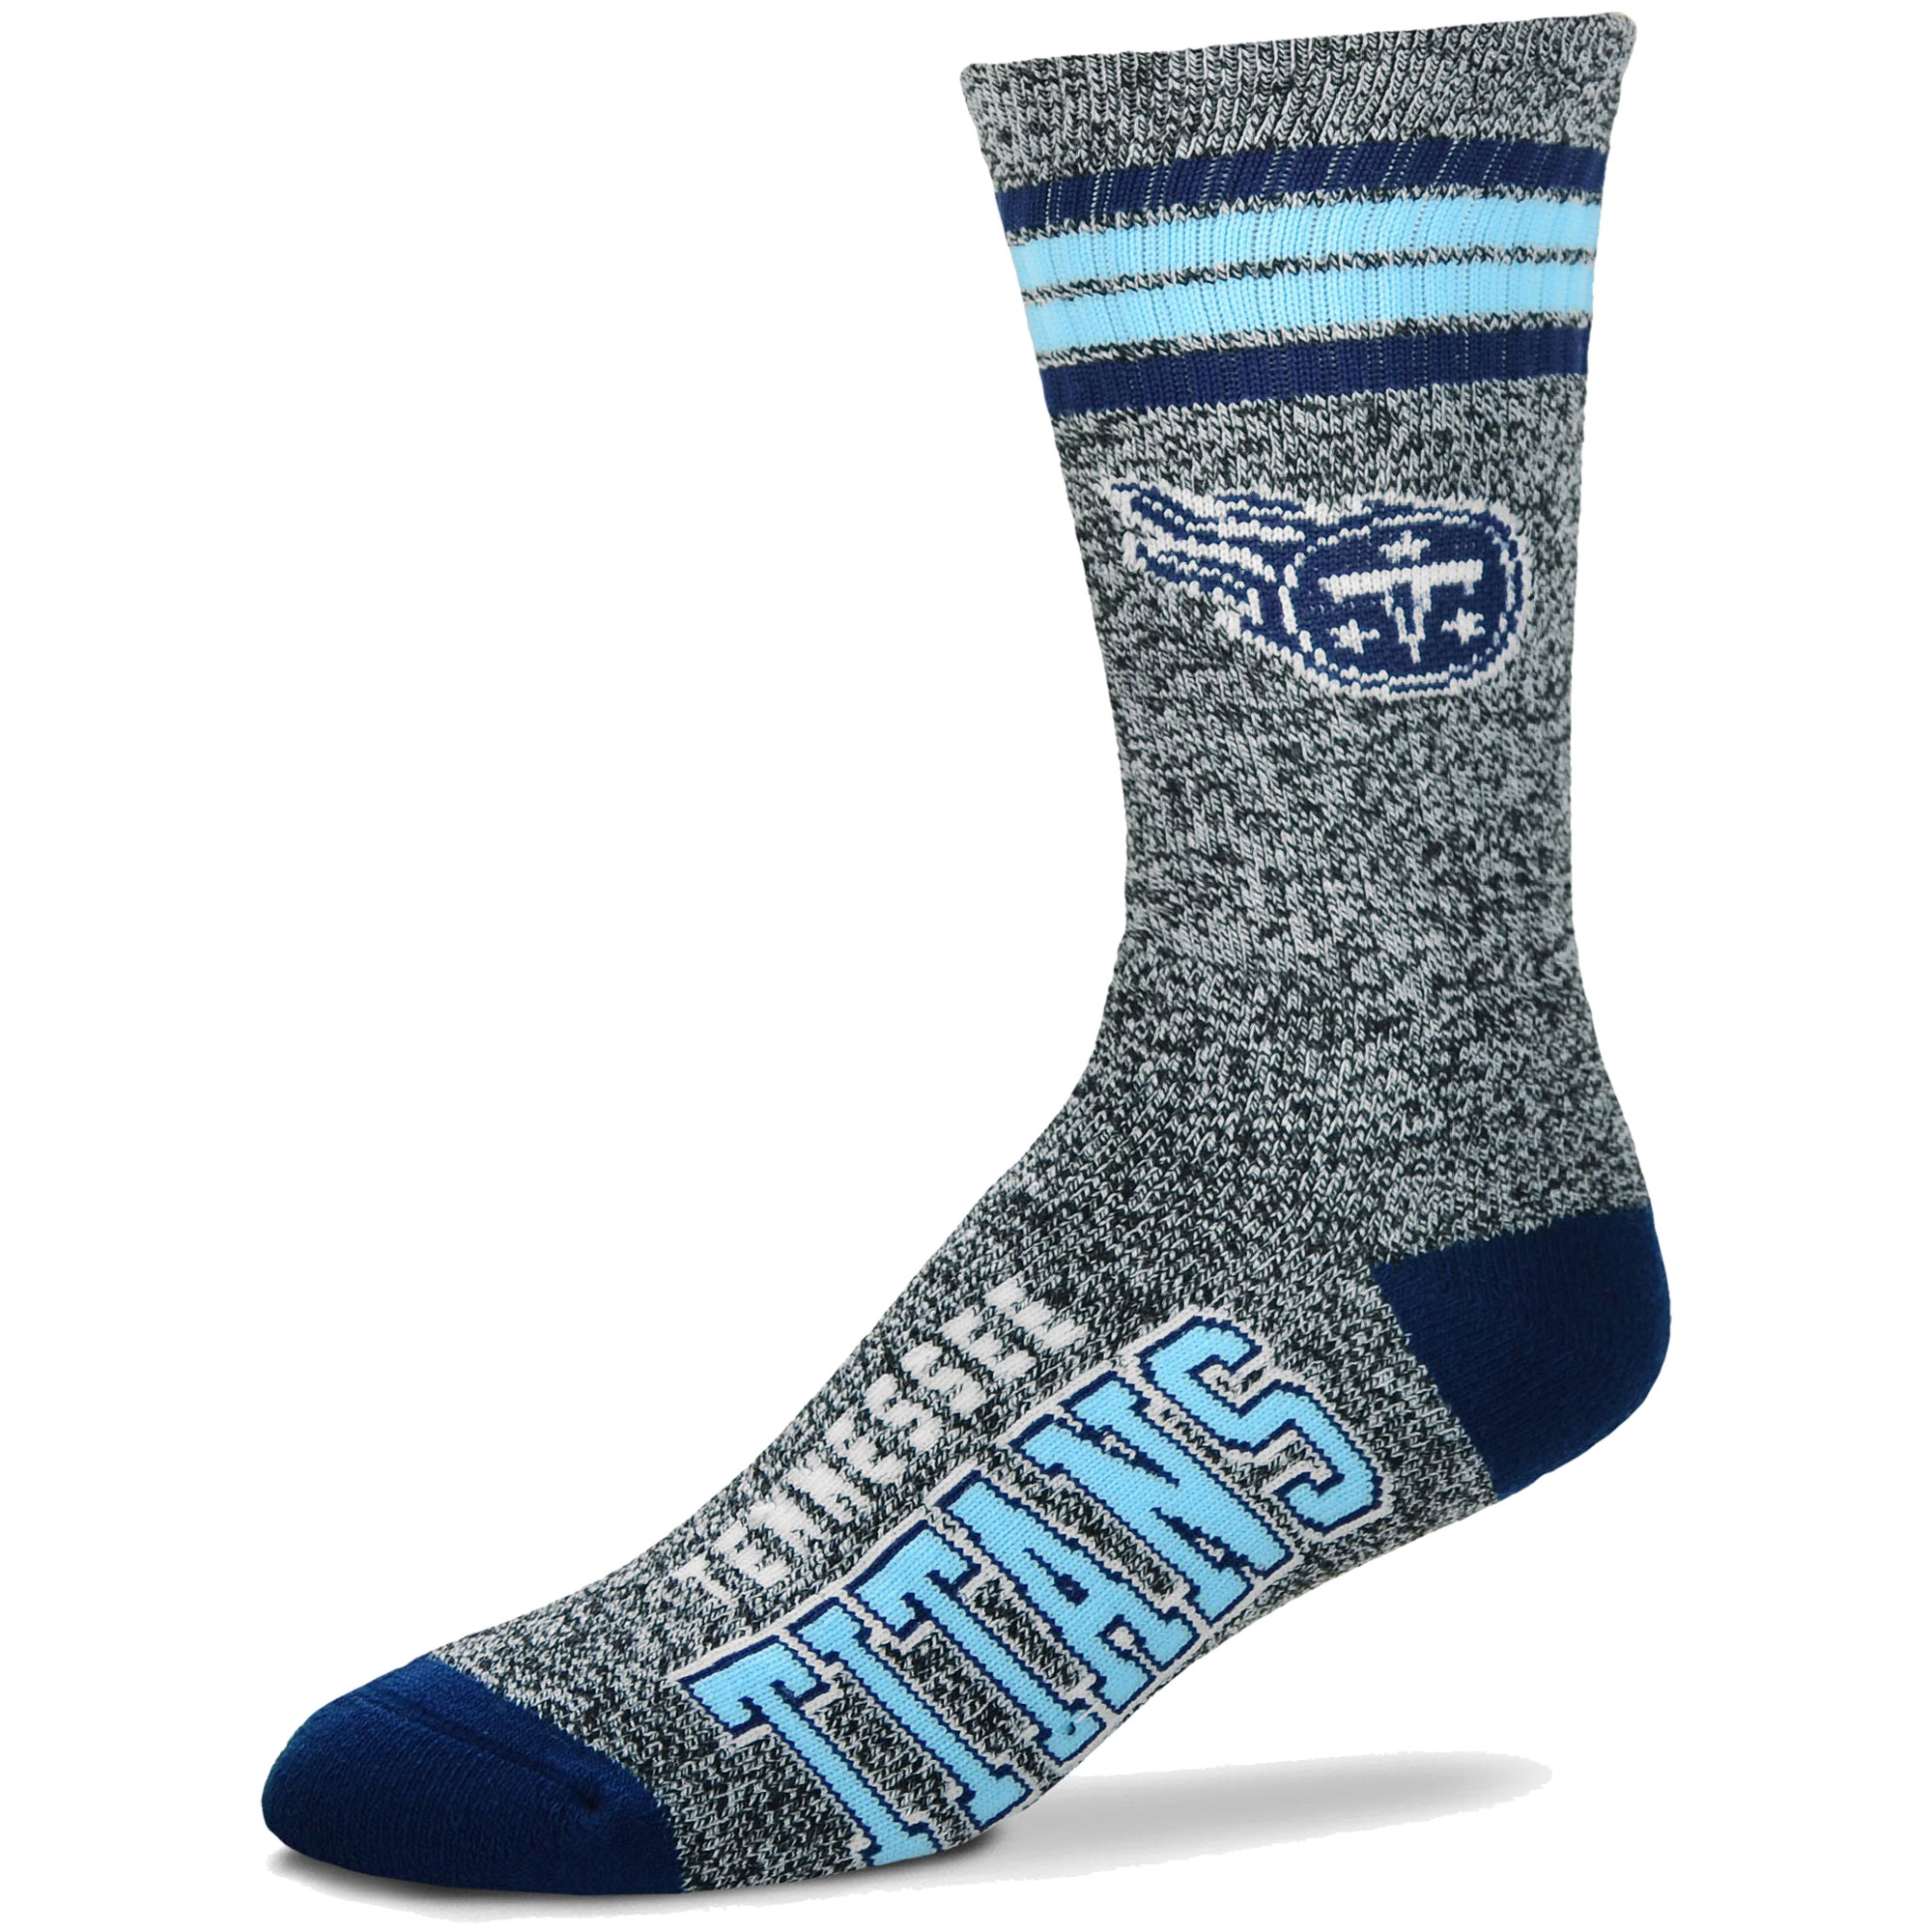 Tennessee Titans For Bare Feet Got Marble Crew Socks - Gray - L